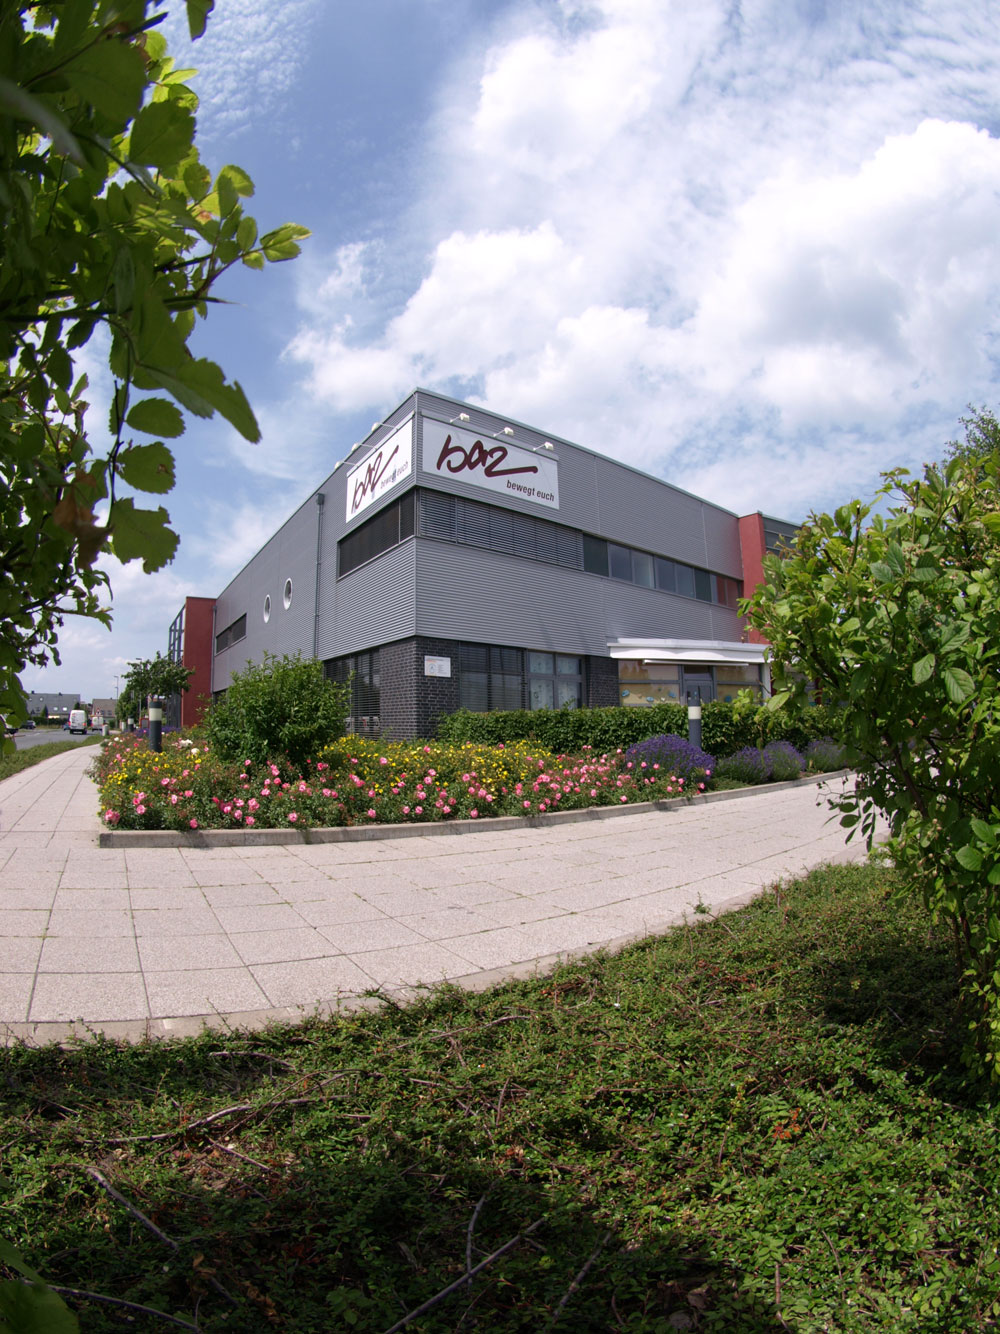 baz Ihr Fitnessstudio in Barsinghausen